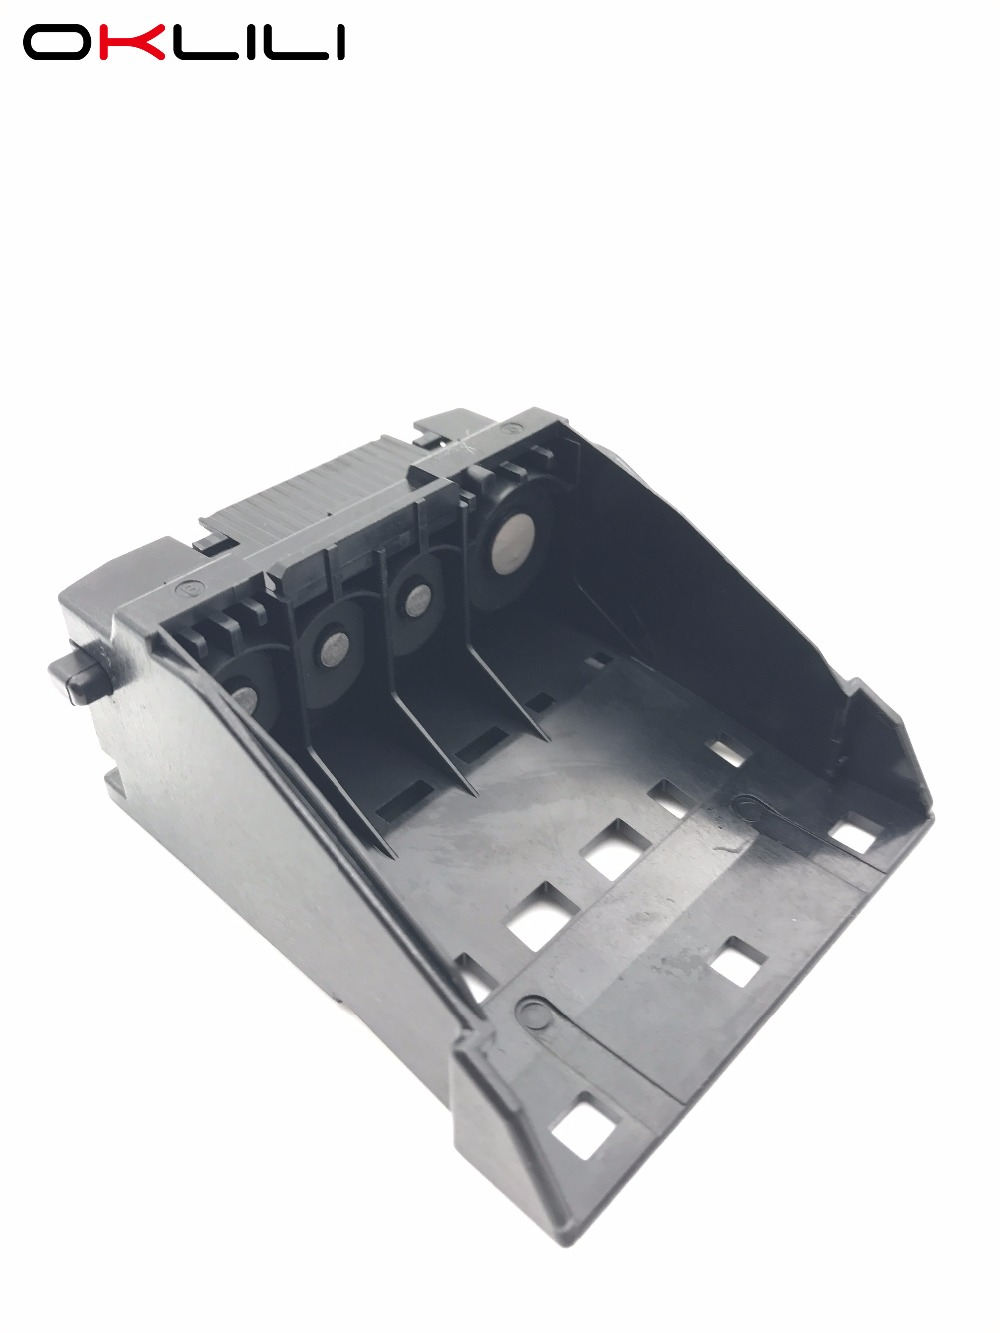 OKLILI QY6-0064 печатающей головки принтера для Canon 560i 850i MP700 MP710 MP730 MP740 i560 i850 iP3100 iP300 iX4000 iX5000